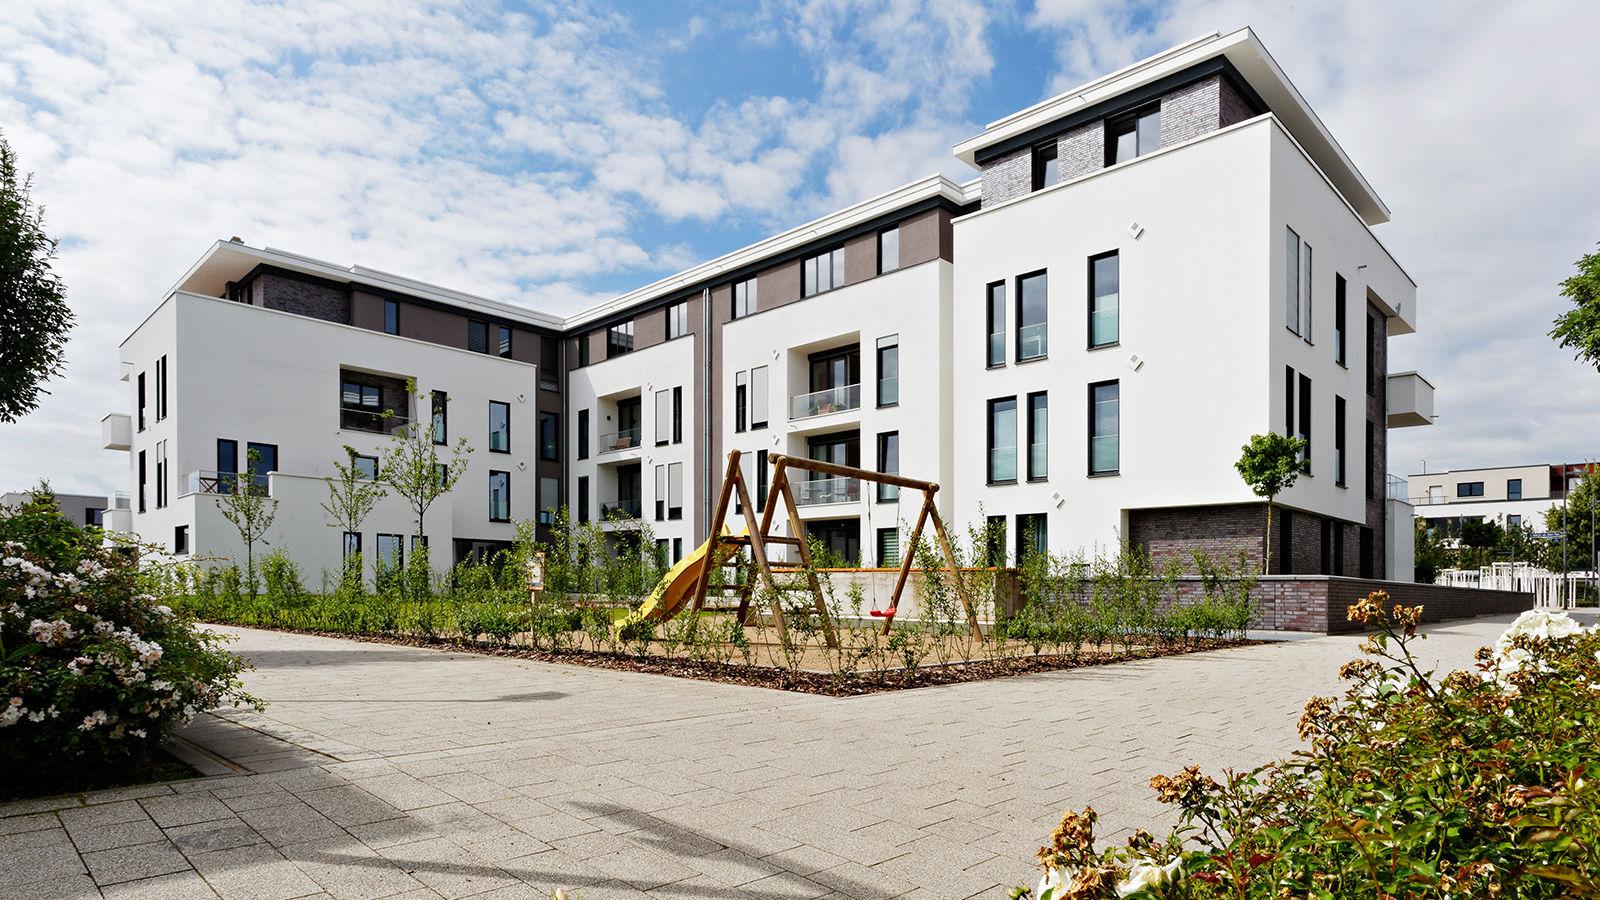 Atelier 21 planquadrat - Planquadrat architekten ...